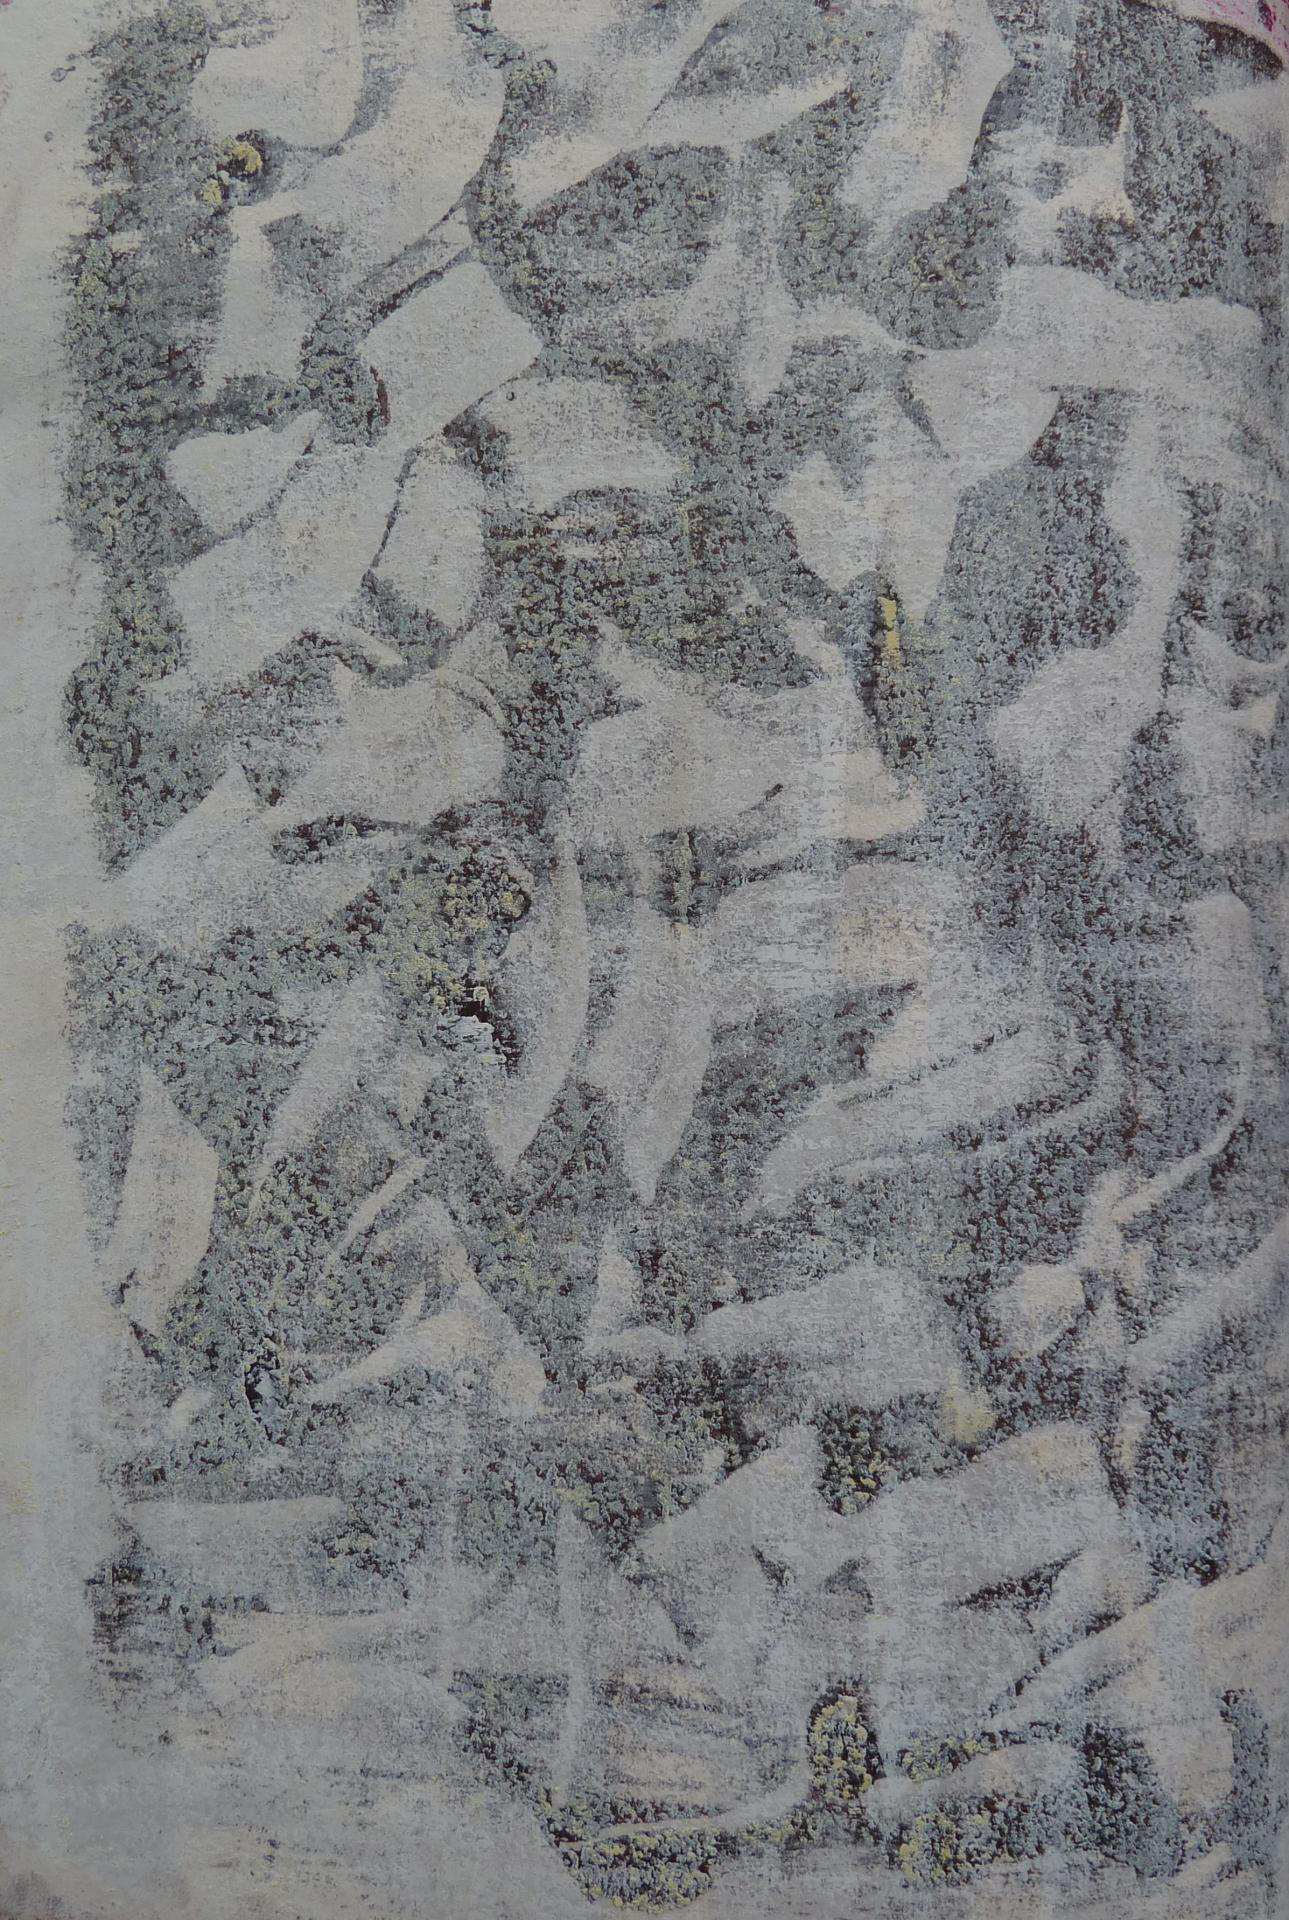 Janv 14 52